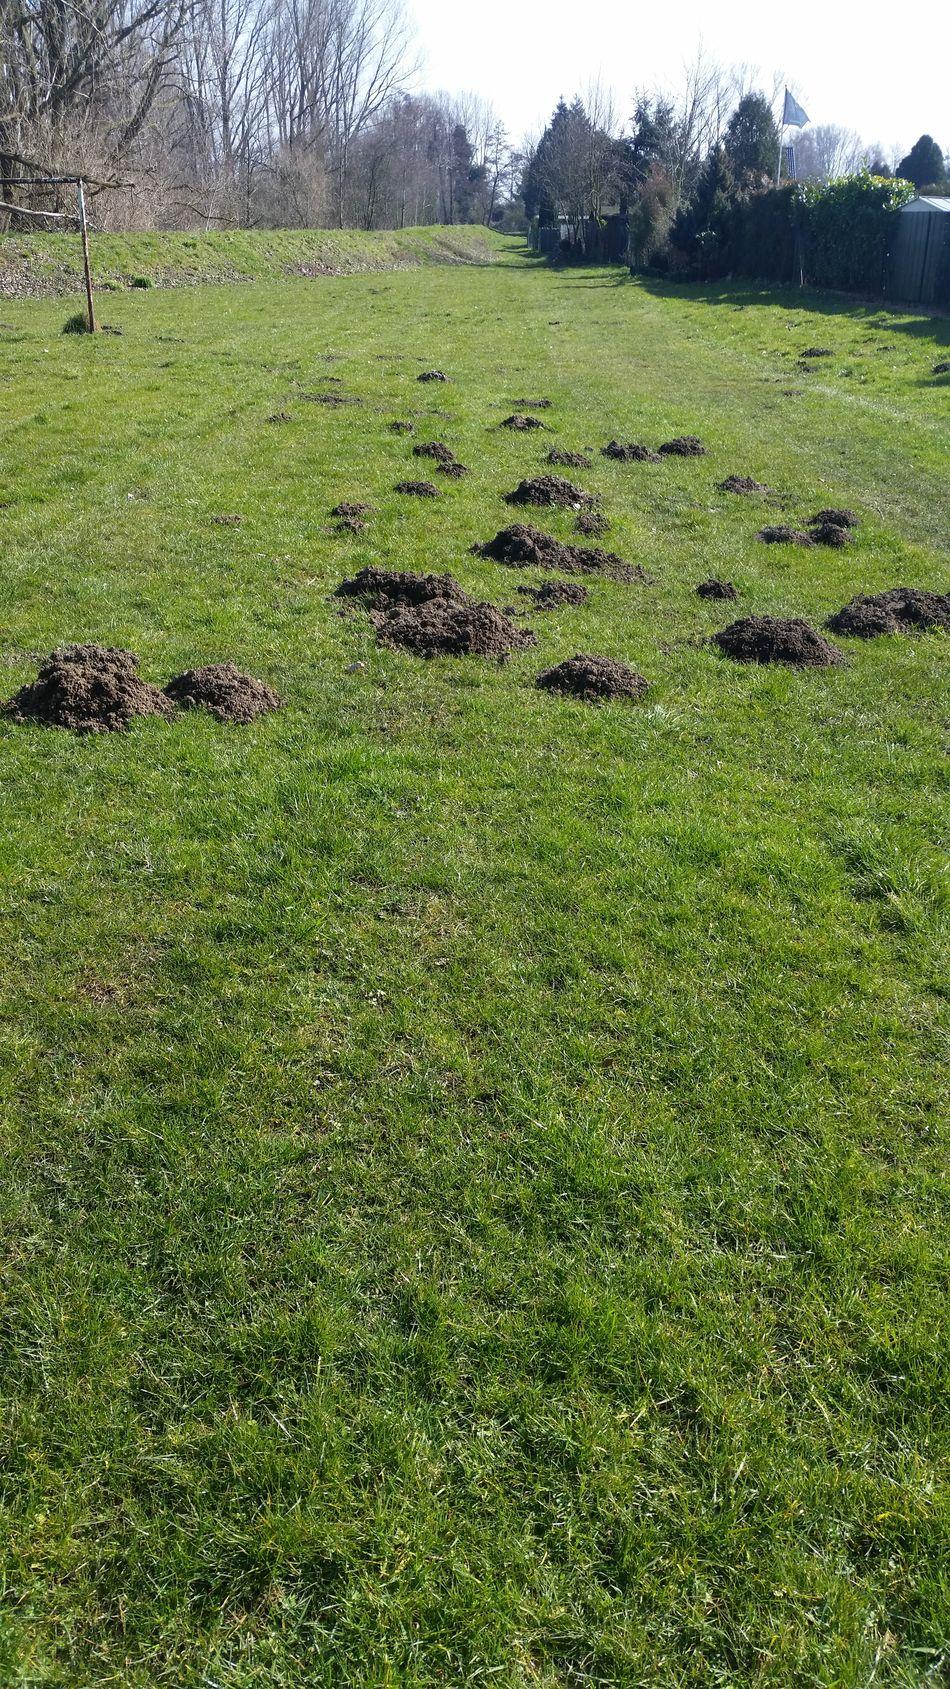 Beauty In Nature Field Grass Grass Area Grassland Green Landscape Maulwurf Maulwurfhügel Maulwurfshügel Mole Nature Outdoors Urban Spring Fever 2016 EyeEm Awards